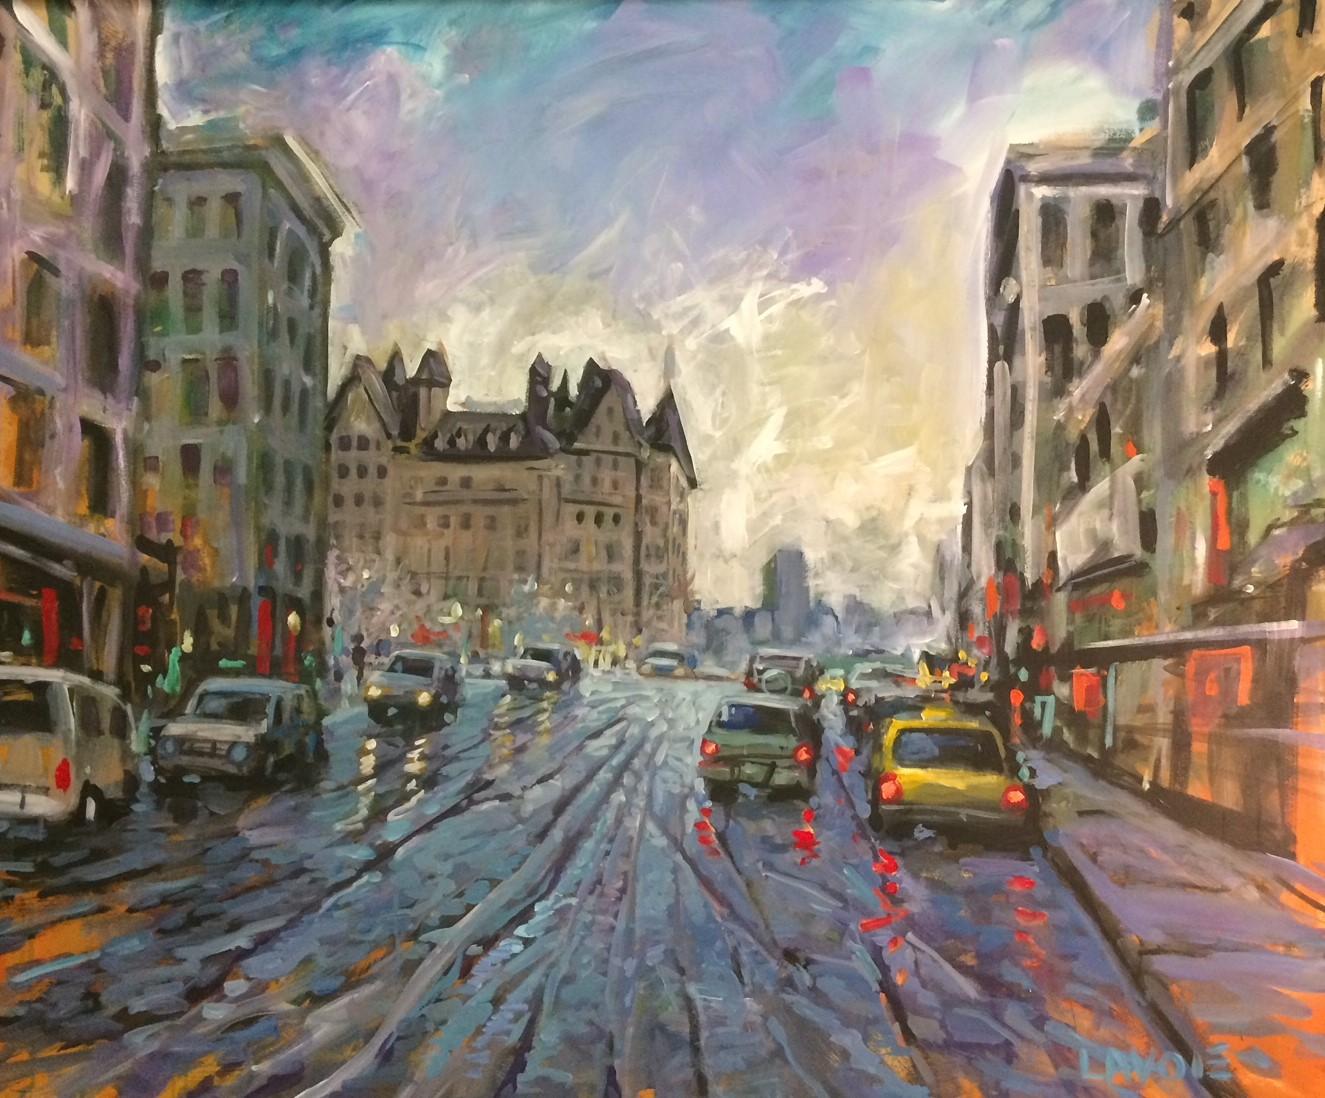 Street scene live art